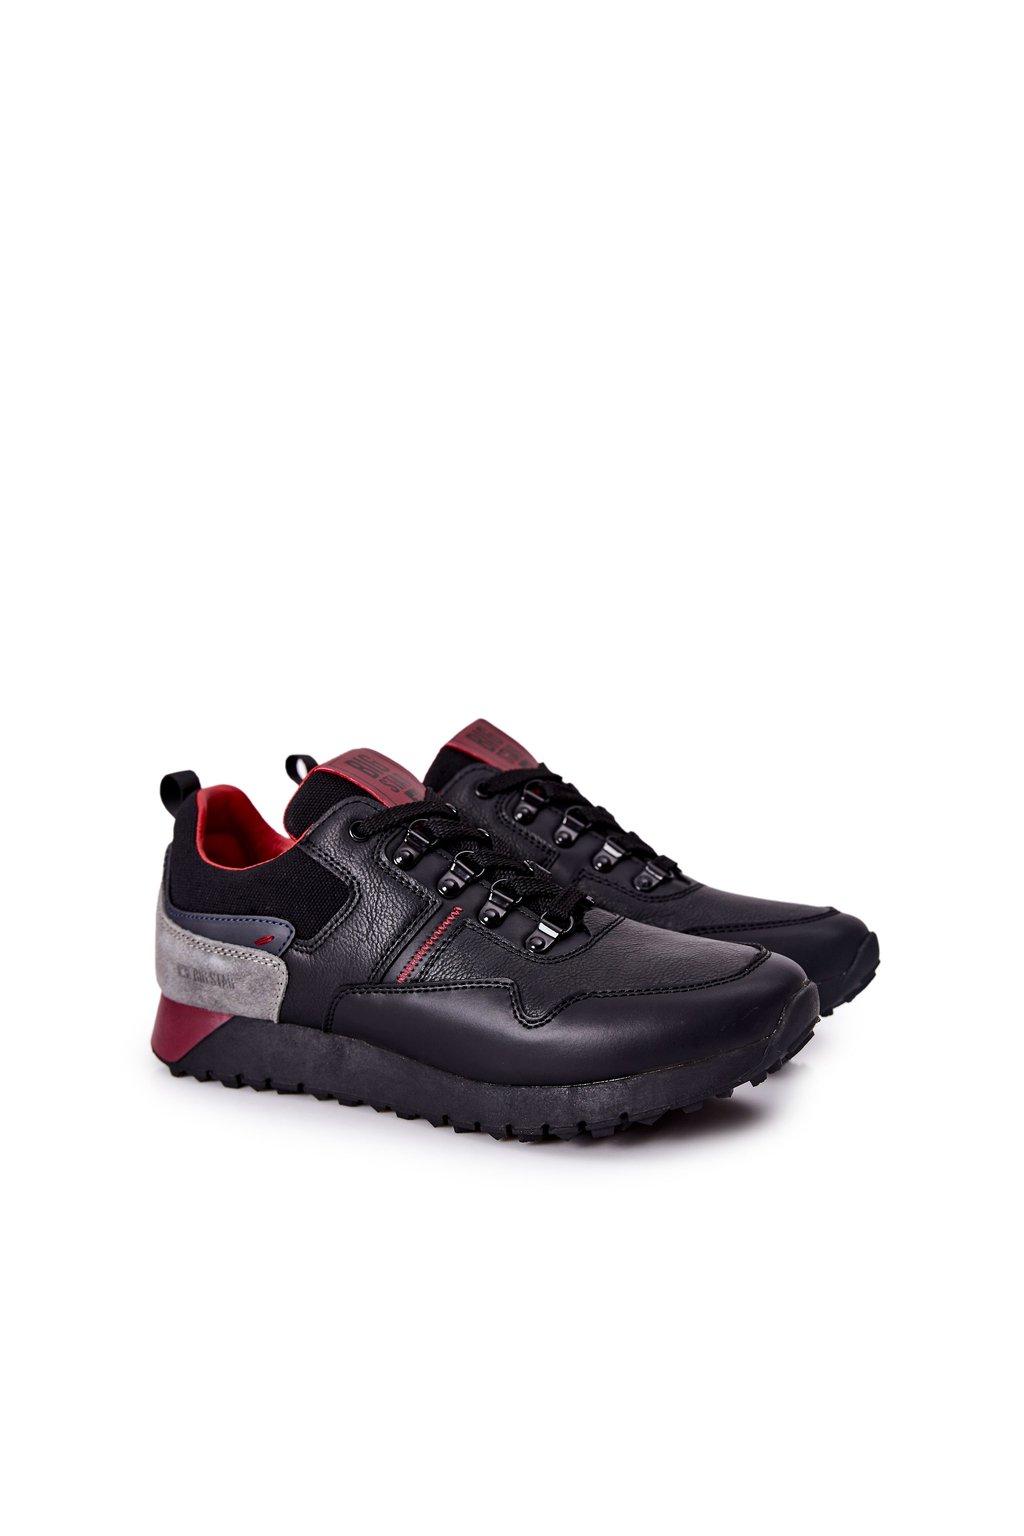 Čierna obuv kód topánok II174090 BLK